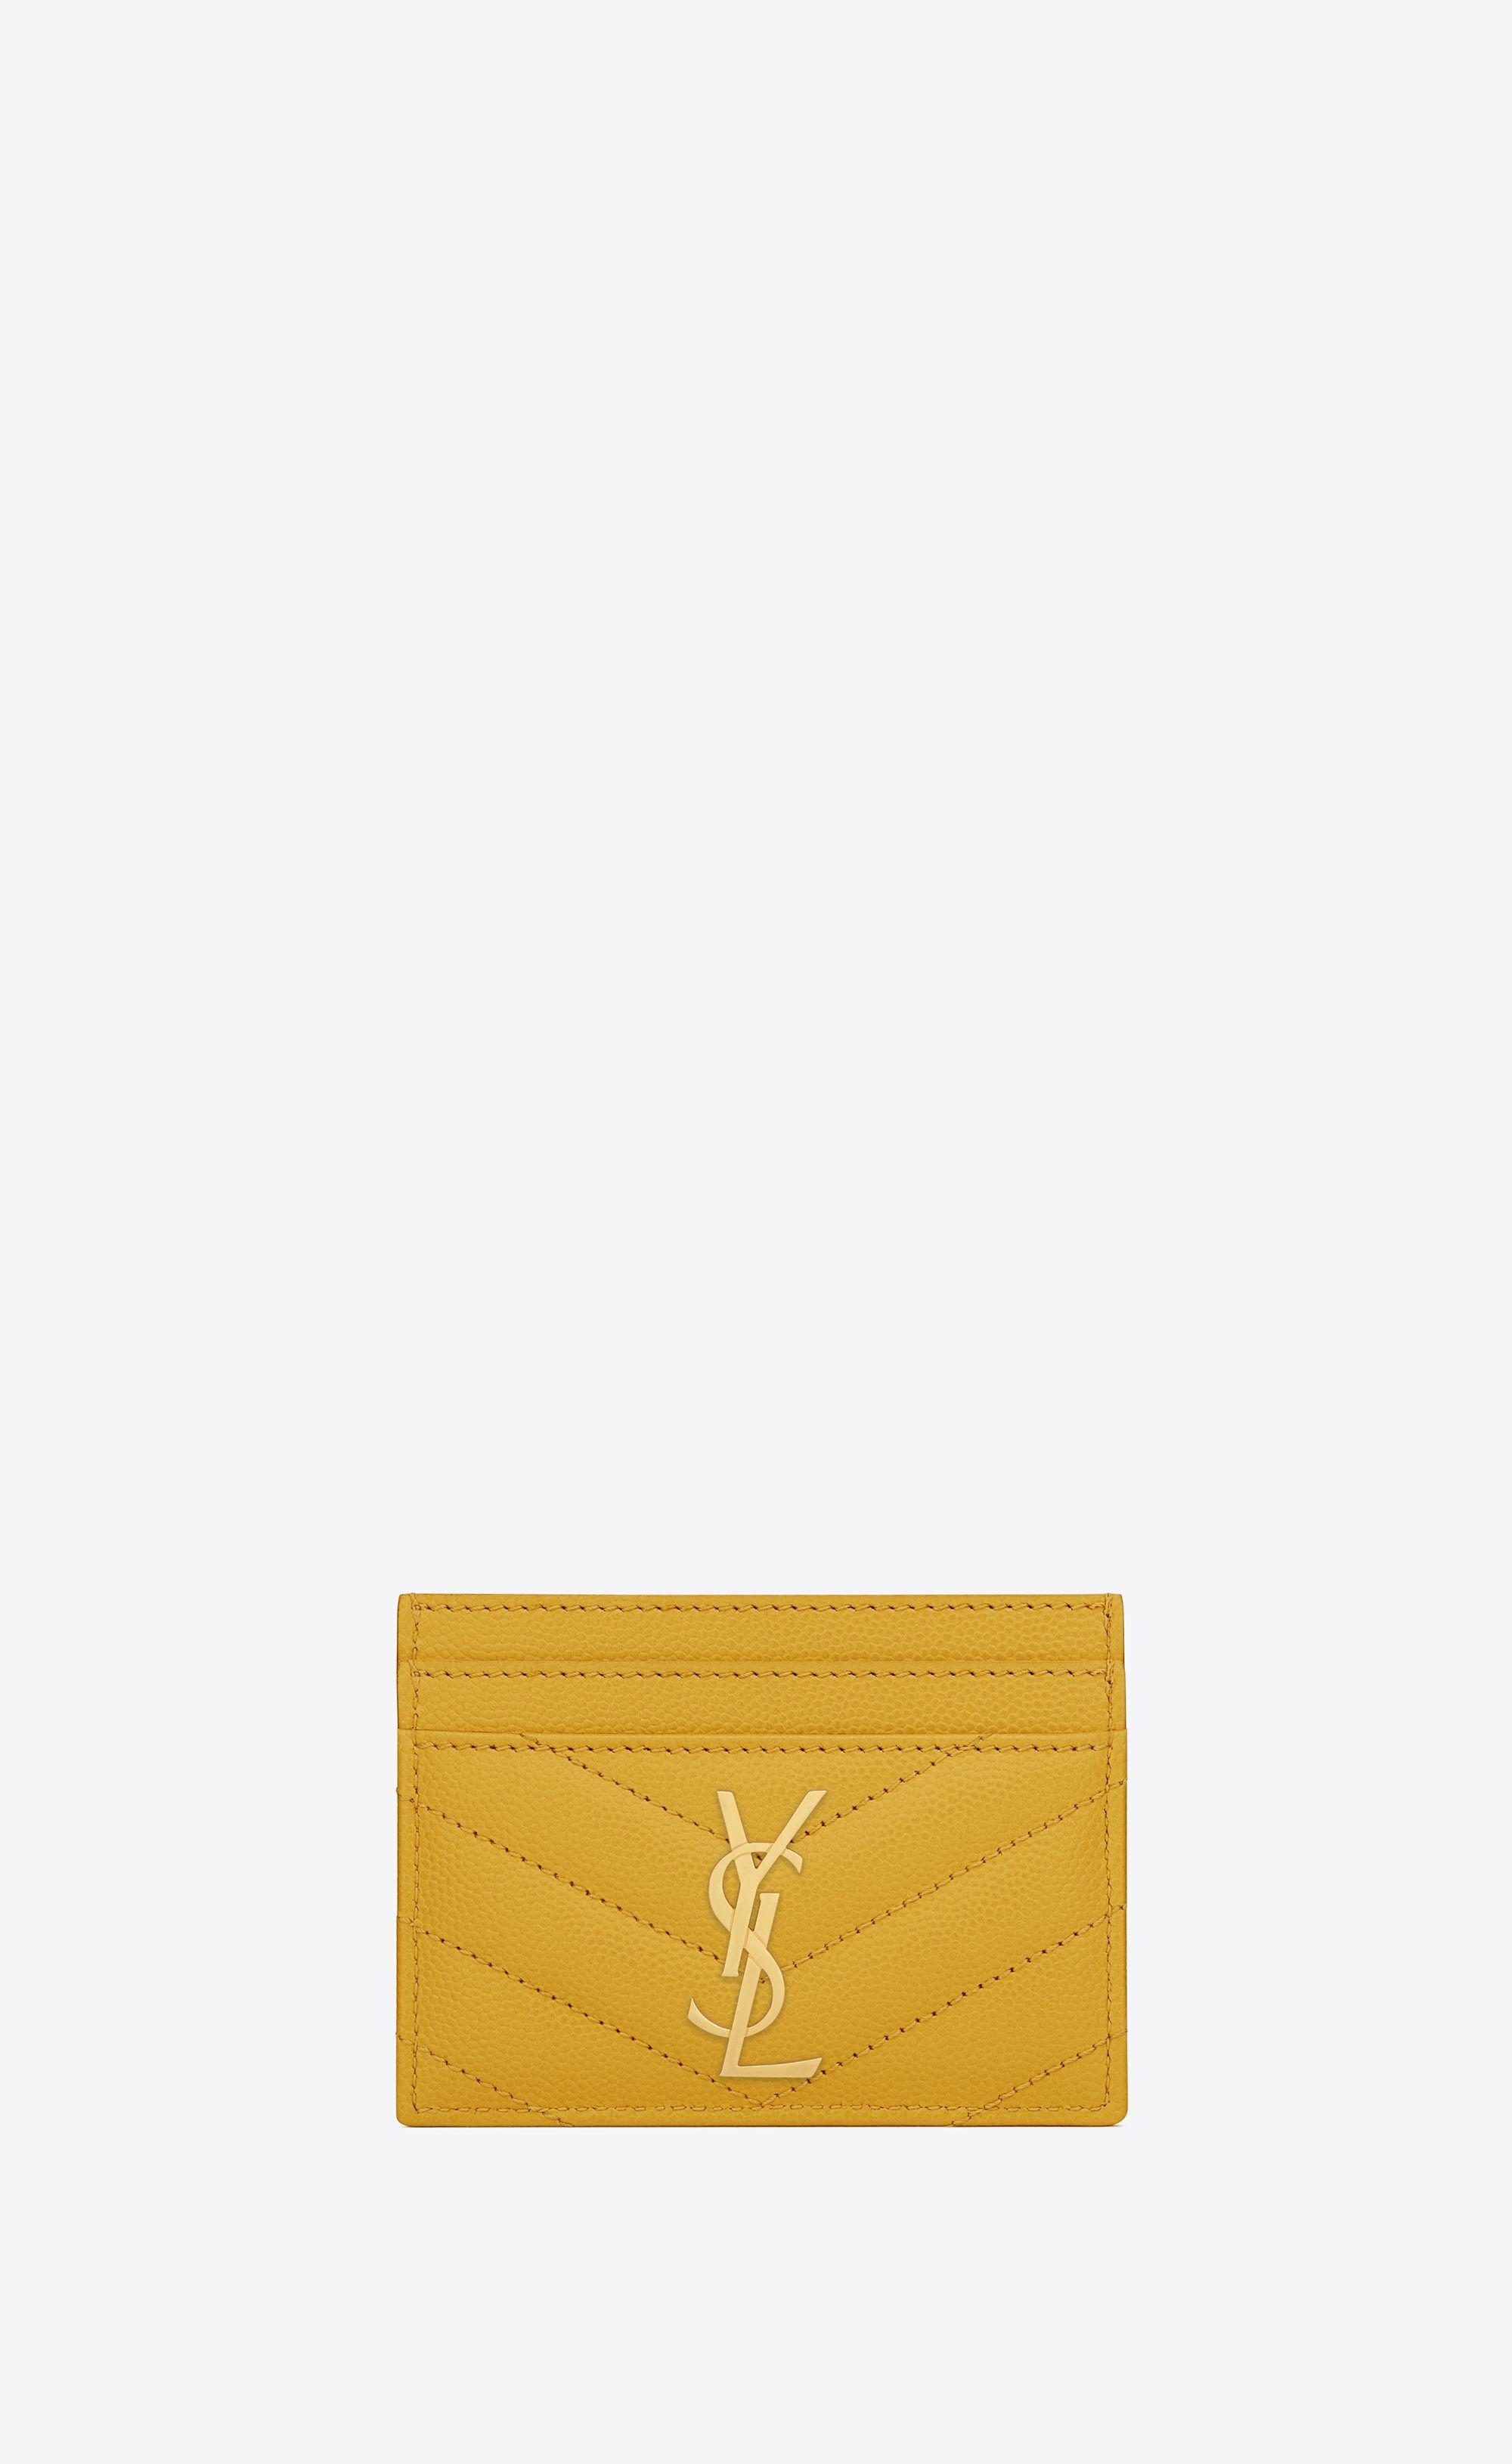 21034736dff  Saint Laurent Monogram Card Case In Grain De Poudre Embossed Leather |  YSL.com